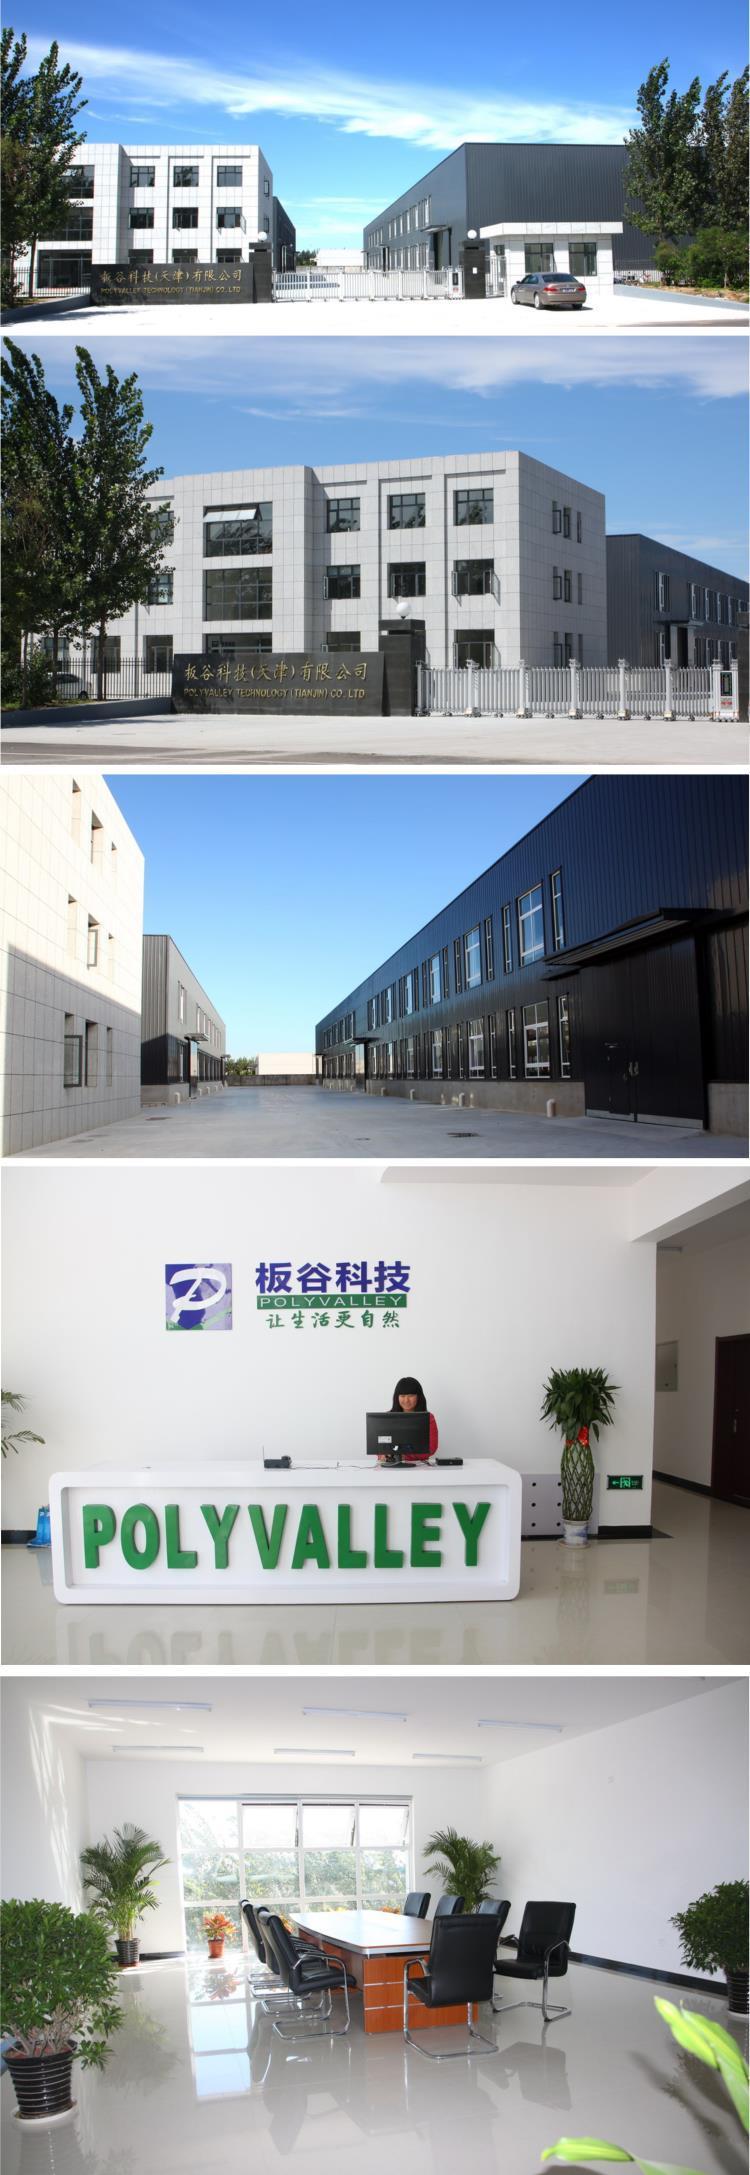 Polycarbonate Sheet Multiwall Sheet Skylight Roofling Sheets 50 Micor UV, 10 Years Warranty